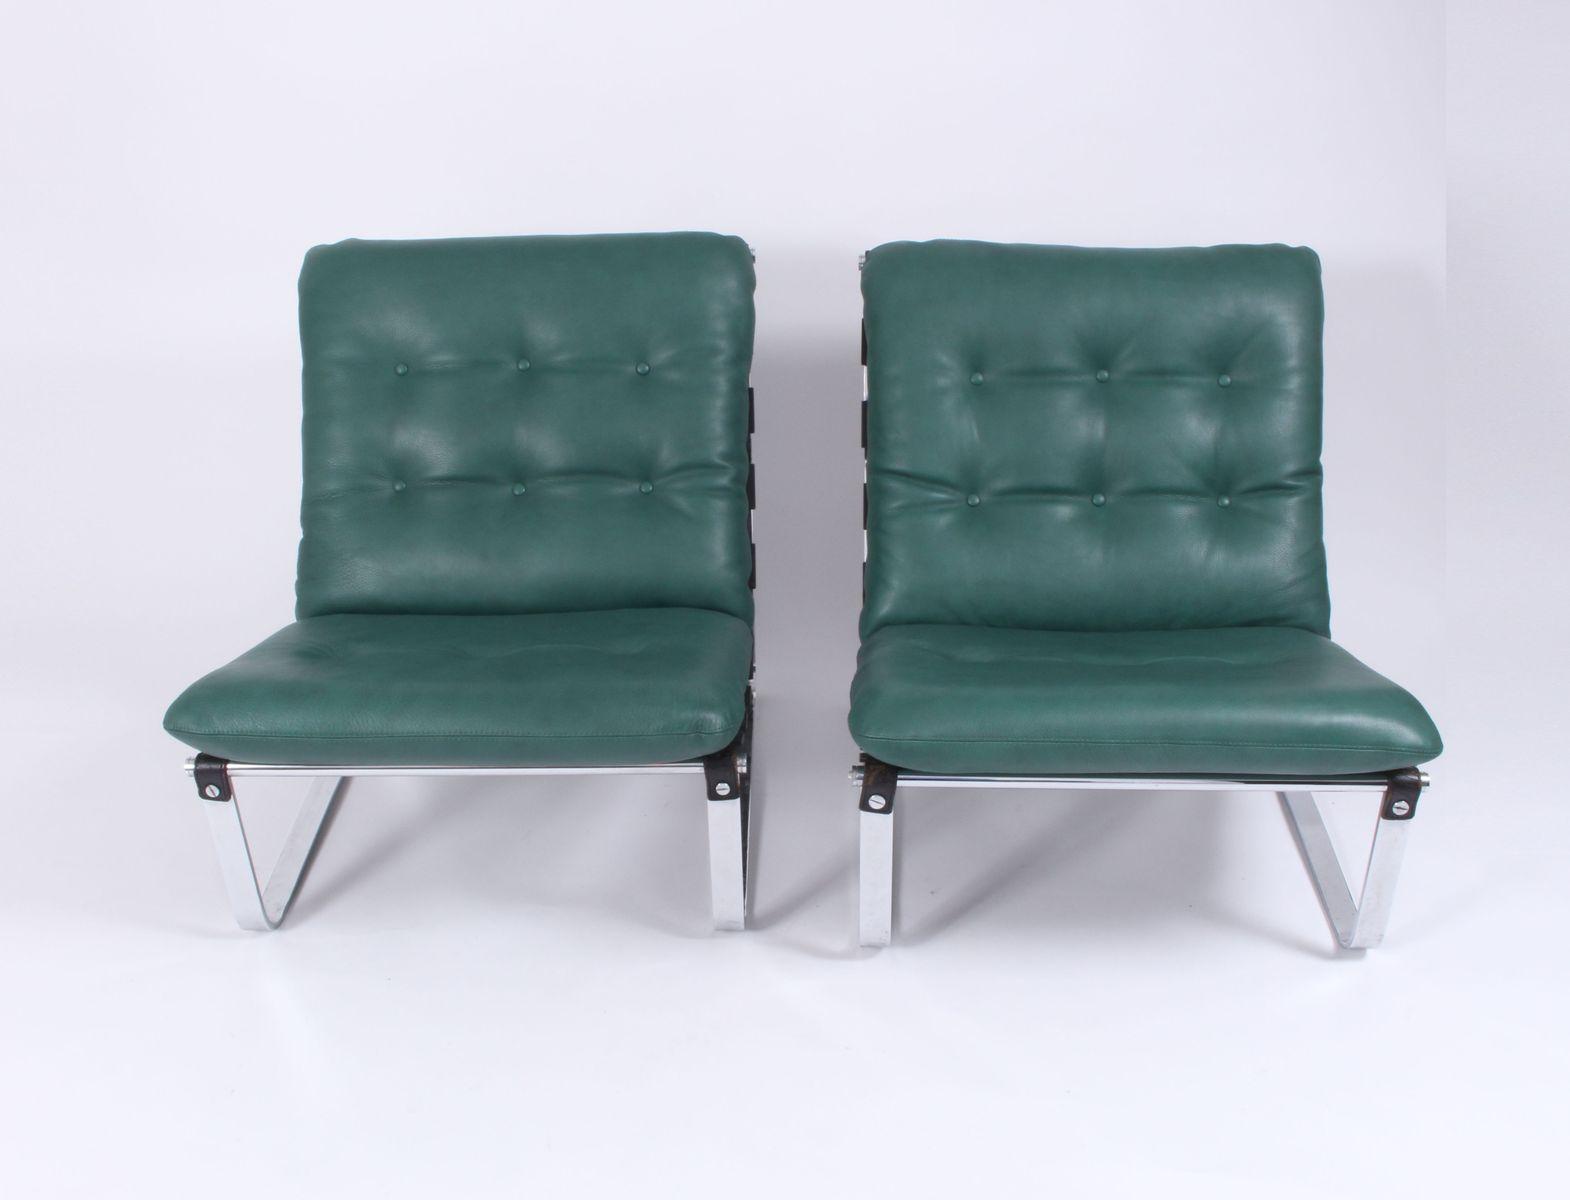 italienische vintage polstersessel 2er set bei pamono kaufen. Black Bedroom Furniture Sets. Home Design Ideas